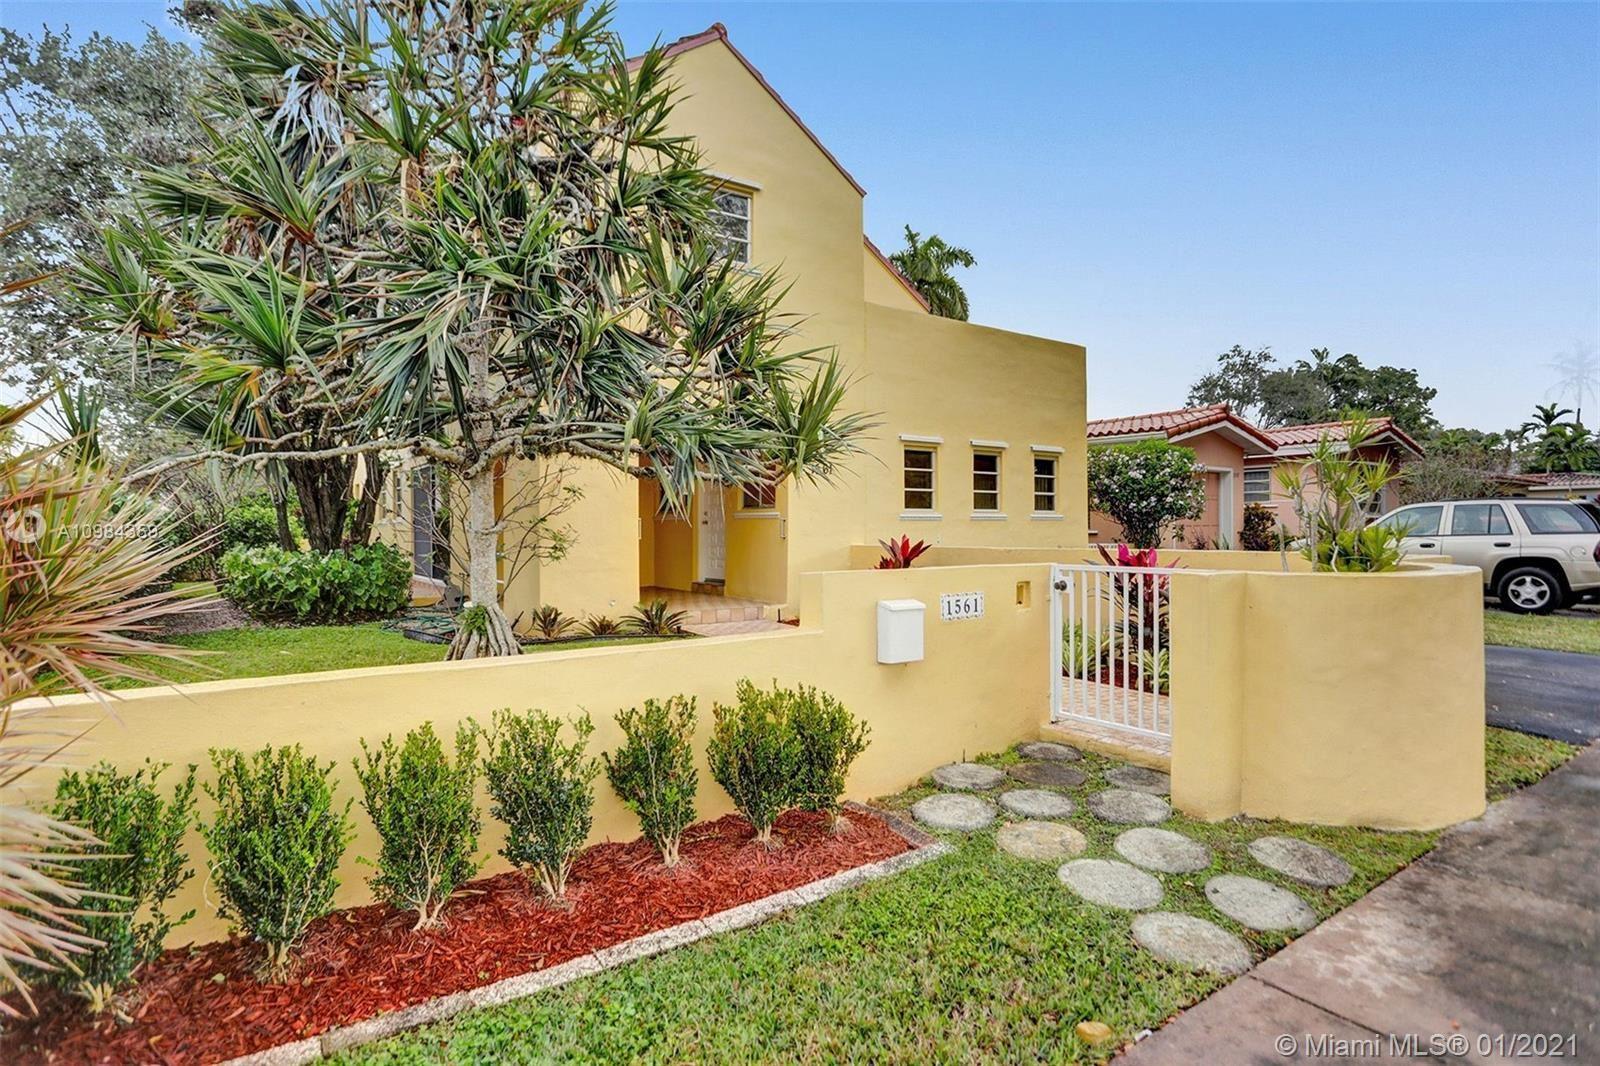 1561 Saragossa Ave, Coral Gables, FL 33134 - #: A10984359